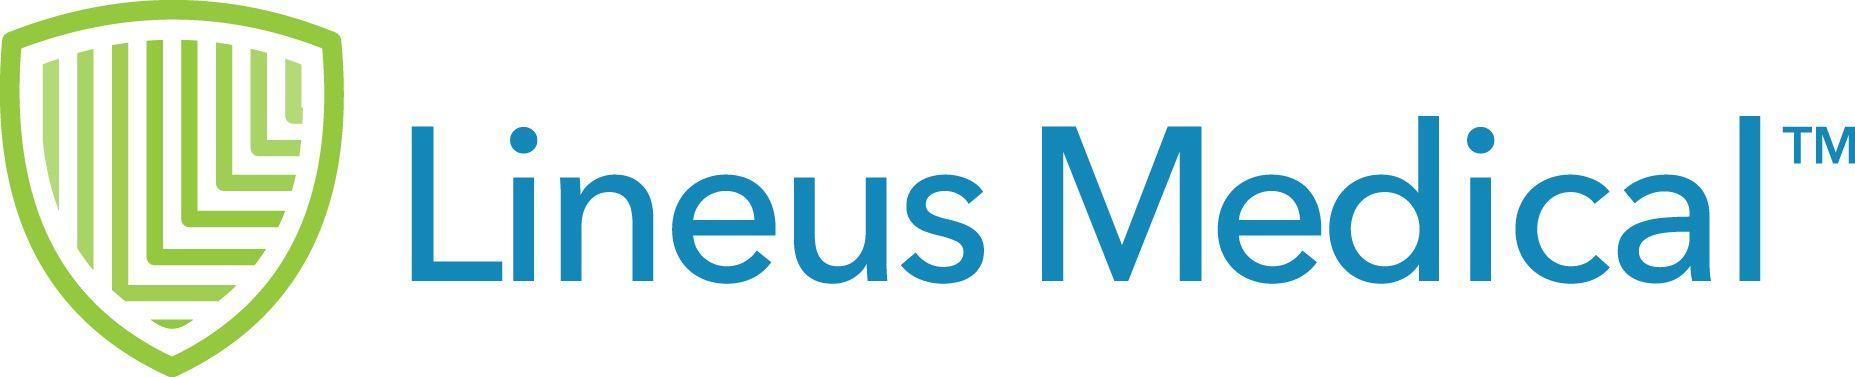 Lineus Medical